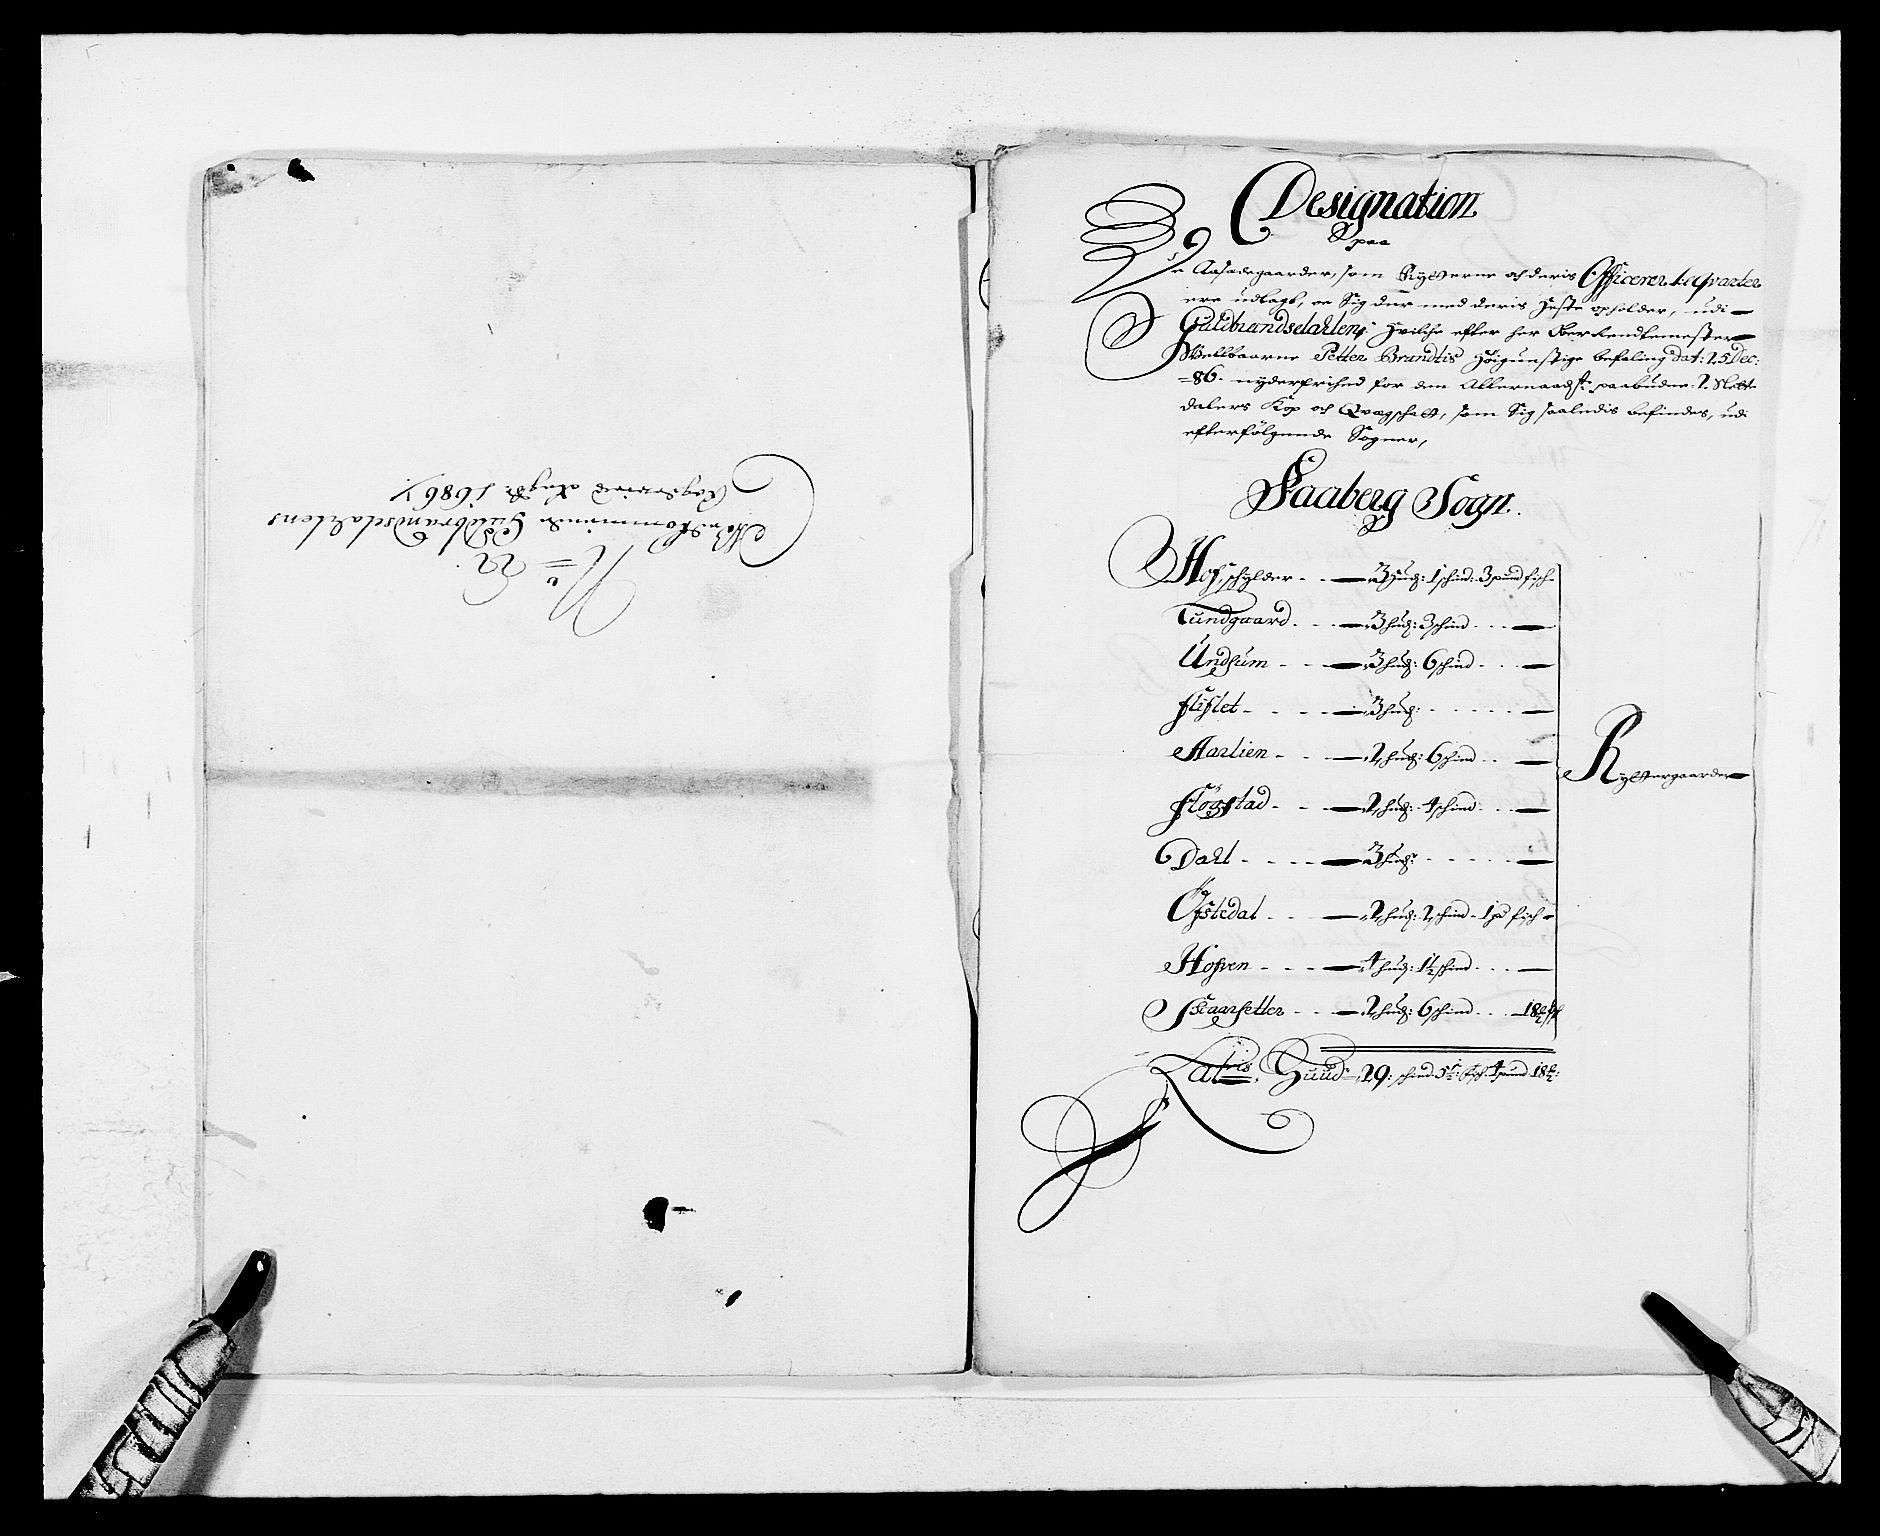 RA, Rentekammeret inntil 1814, Reviderte regnskaper, Fogderegnskap, R17/L1161: Fogderegnskap Gudbrandsdal, 1682-1689, s. 298